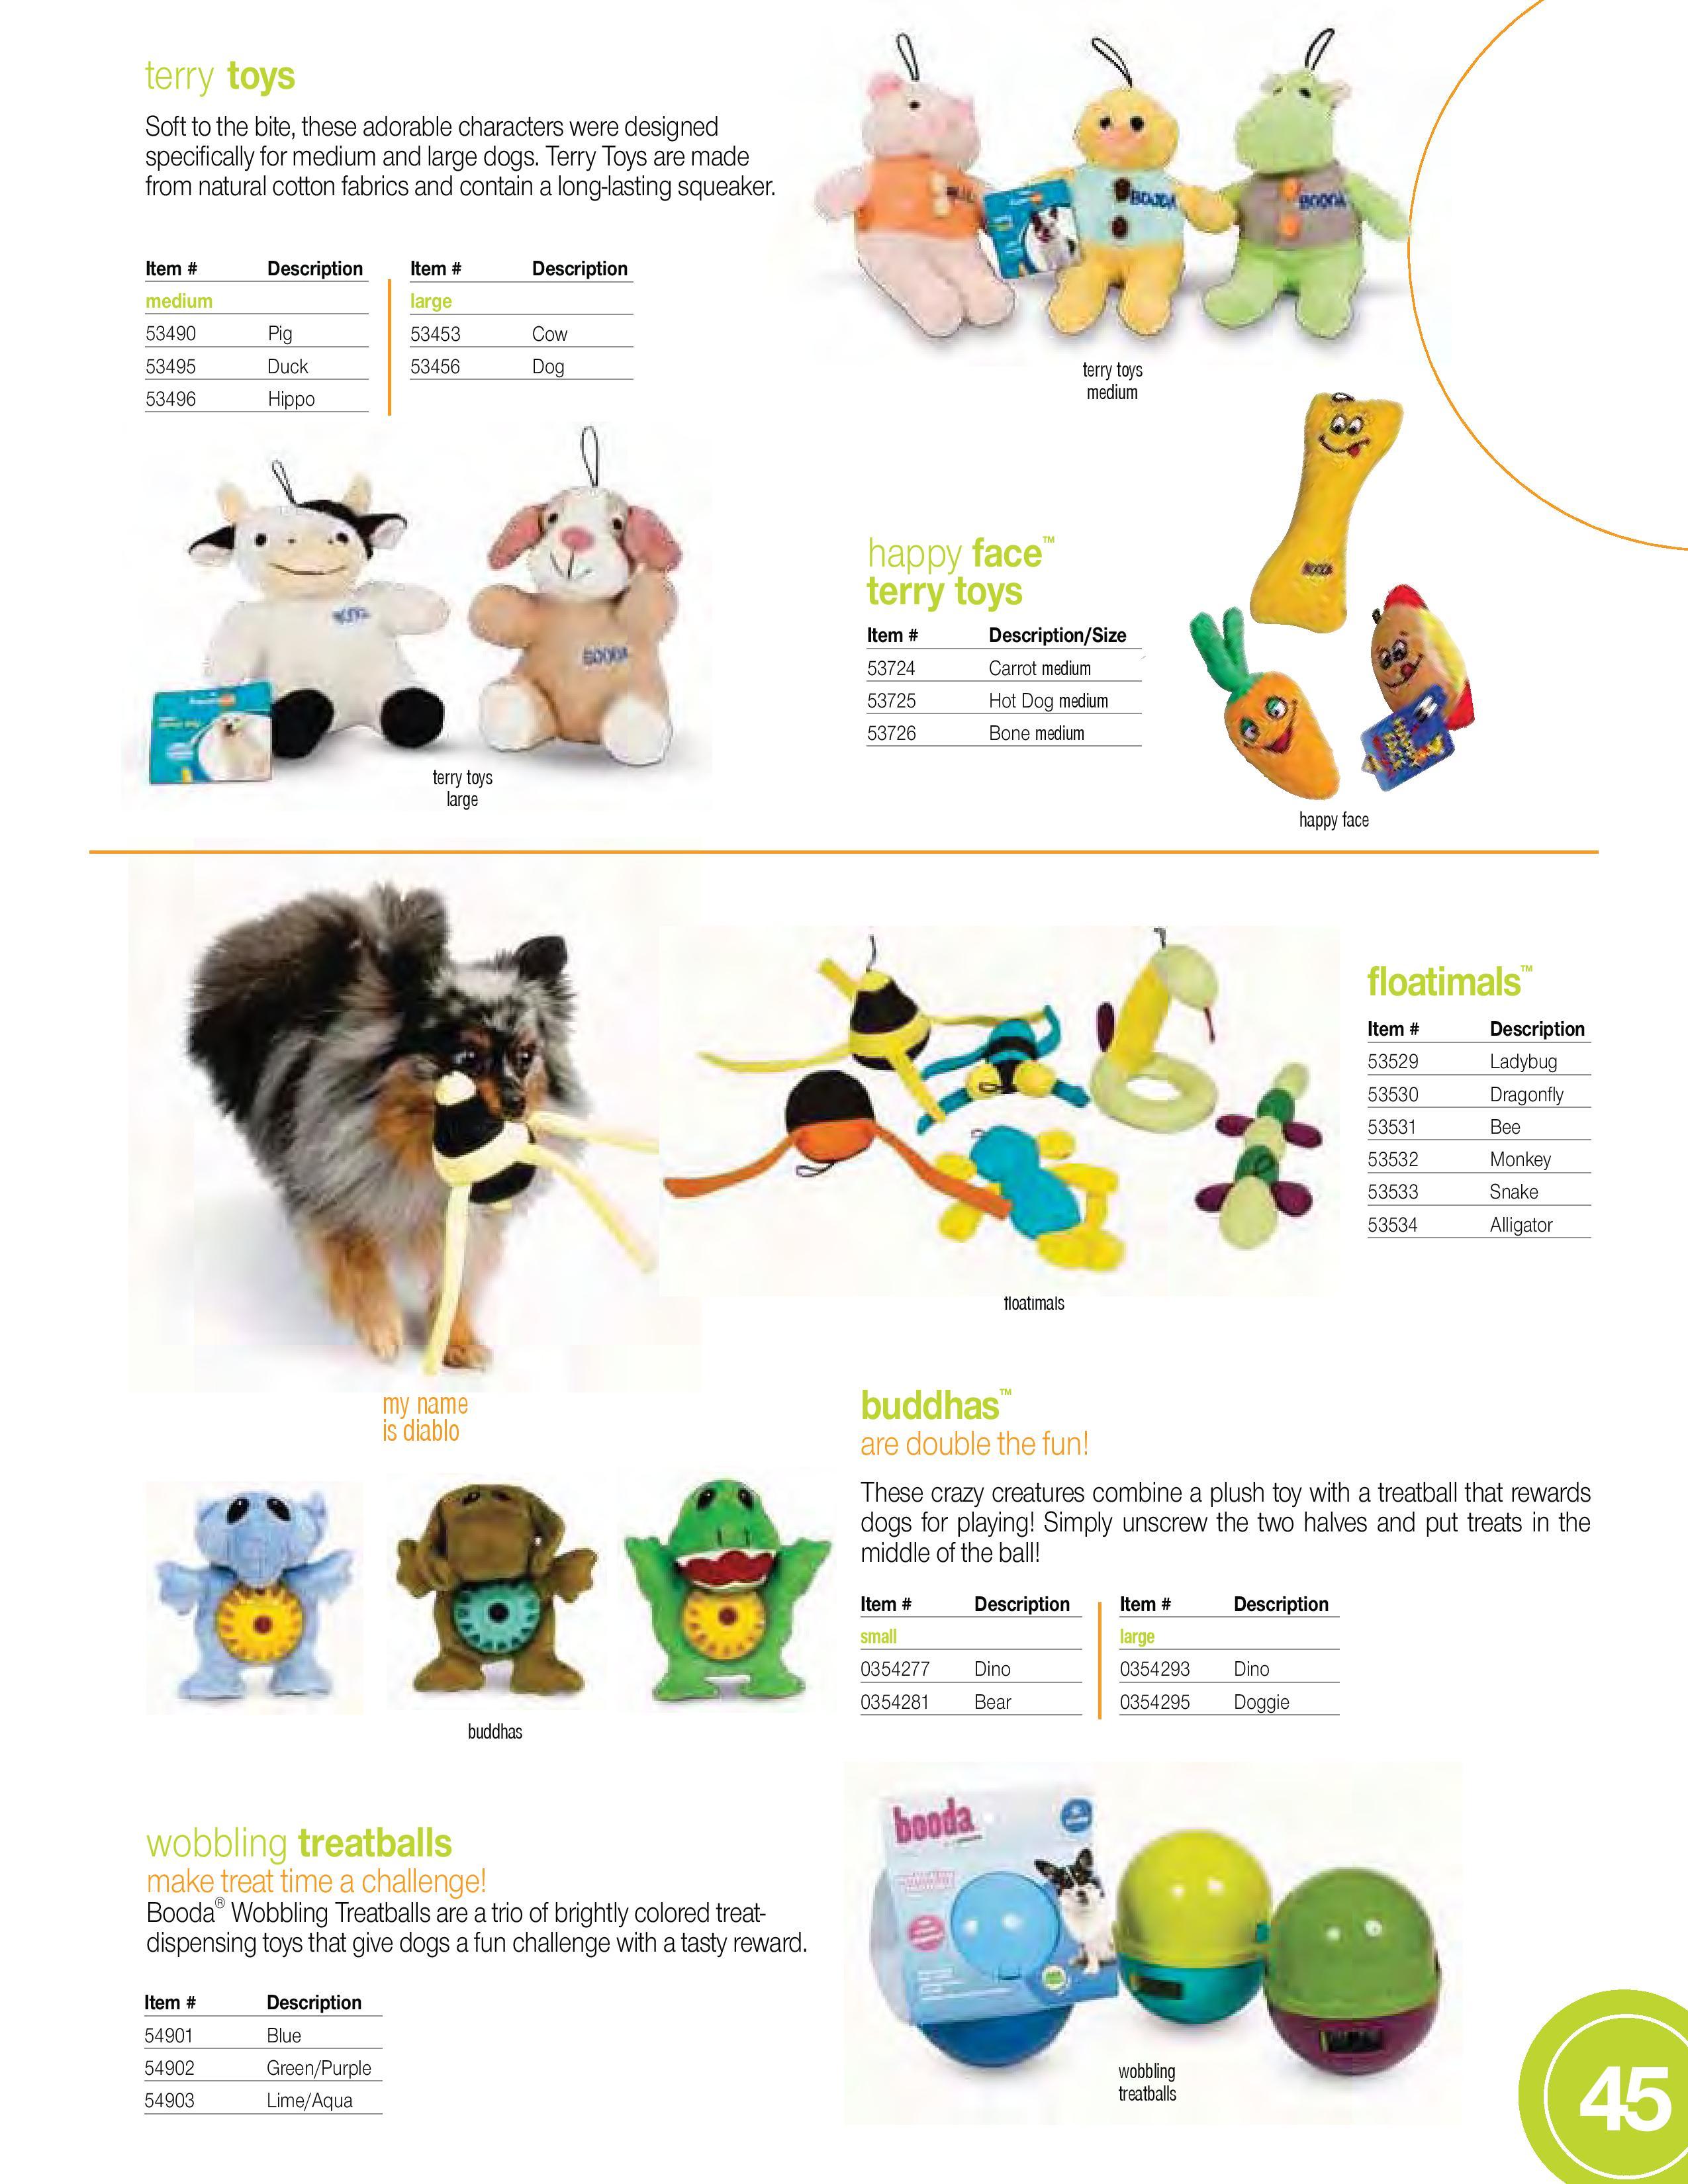 Emirtaes Animals Export 1 (45)